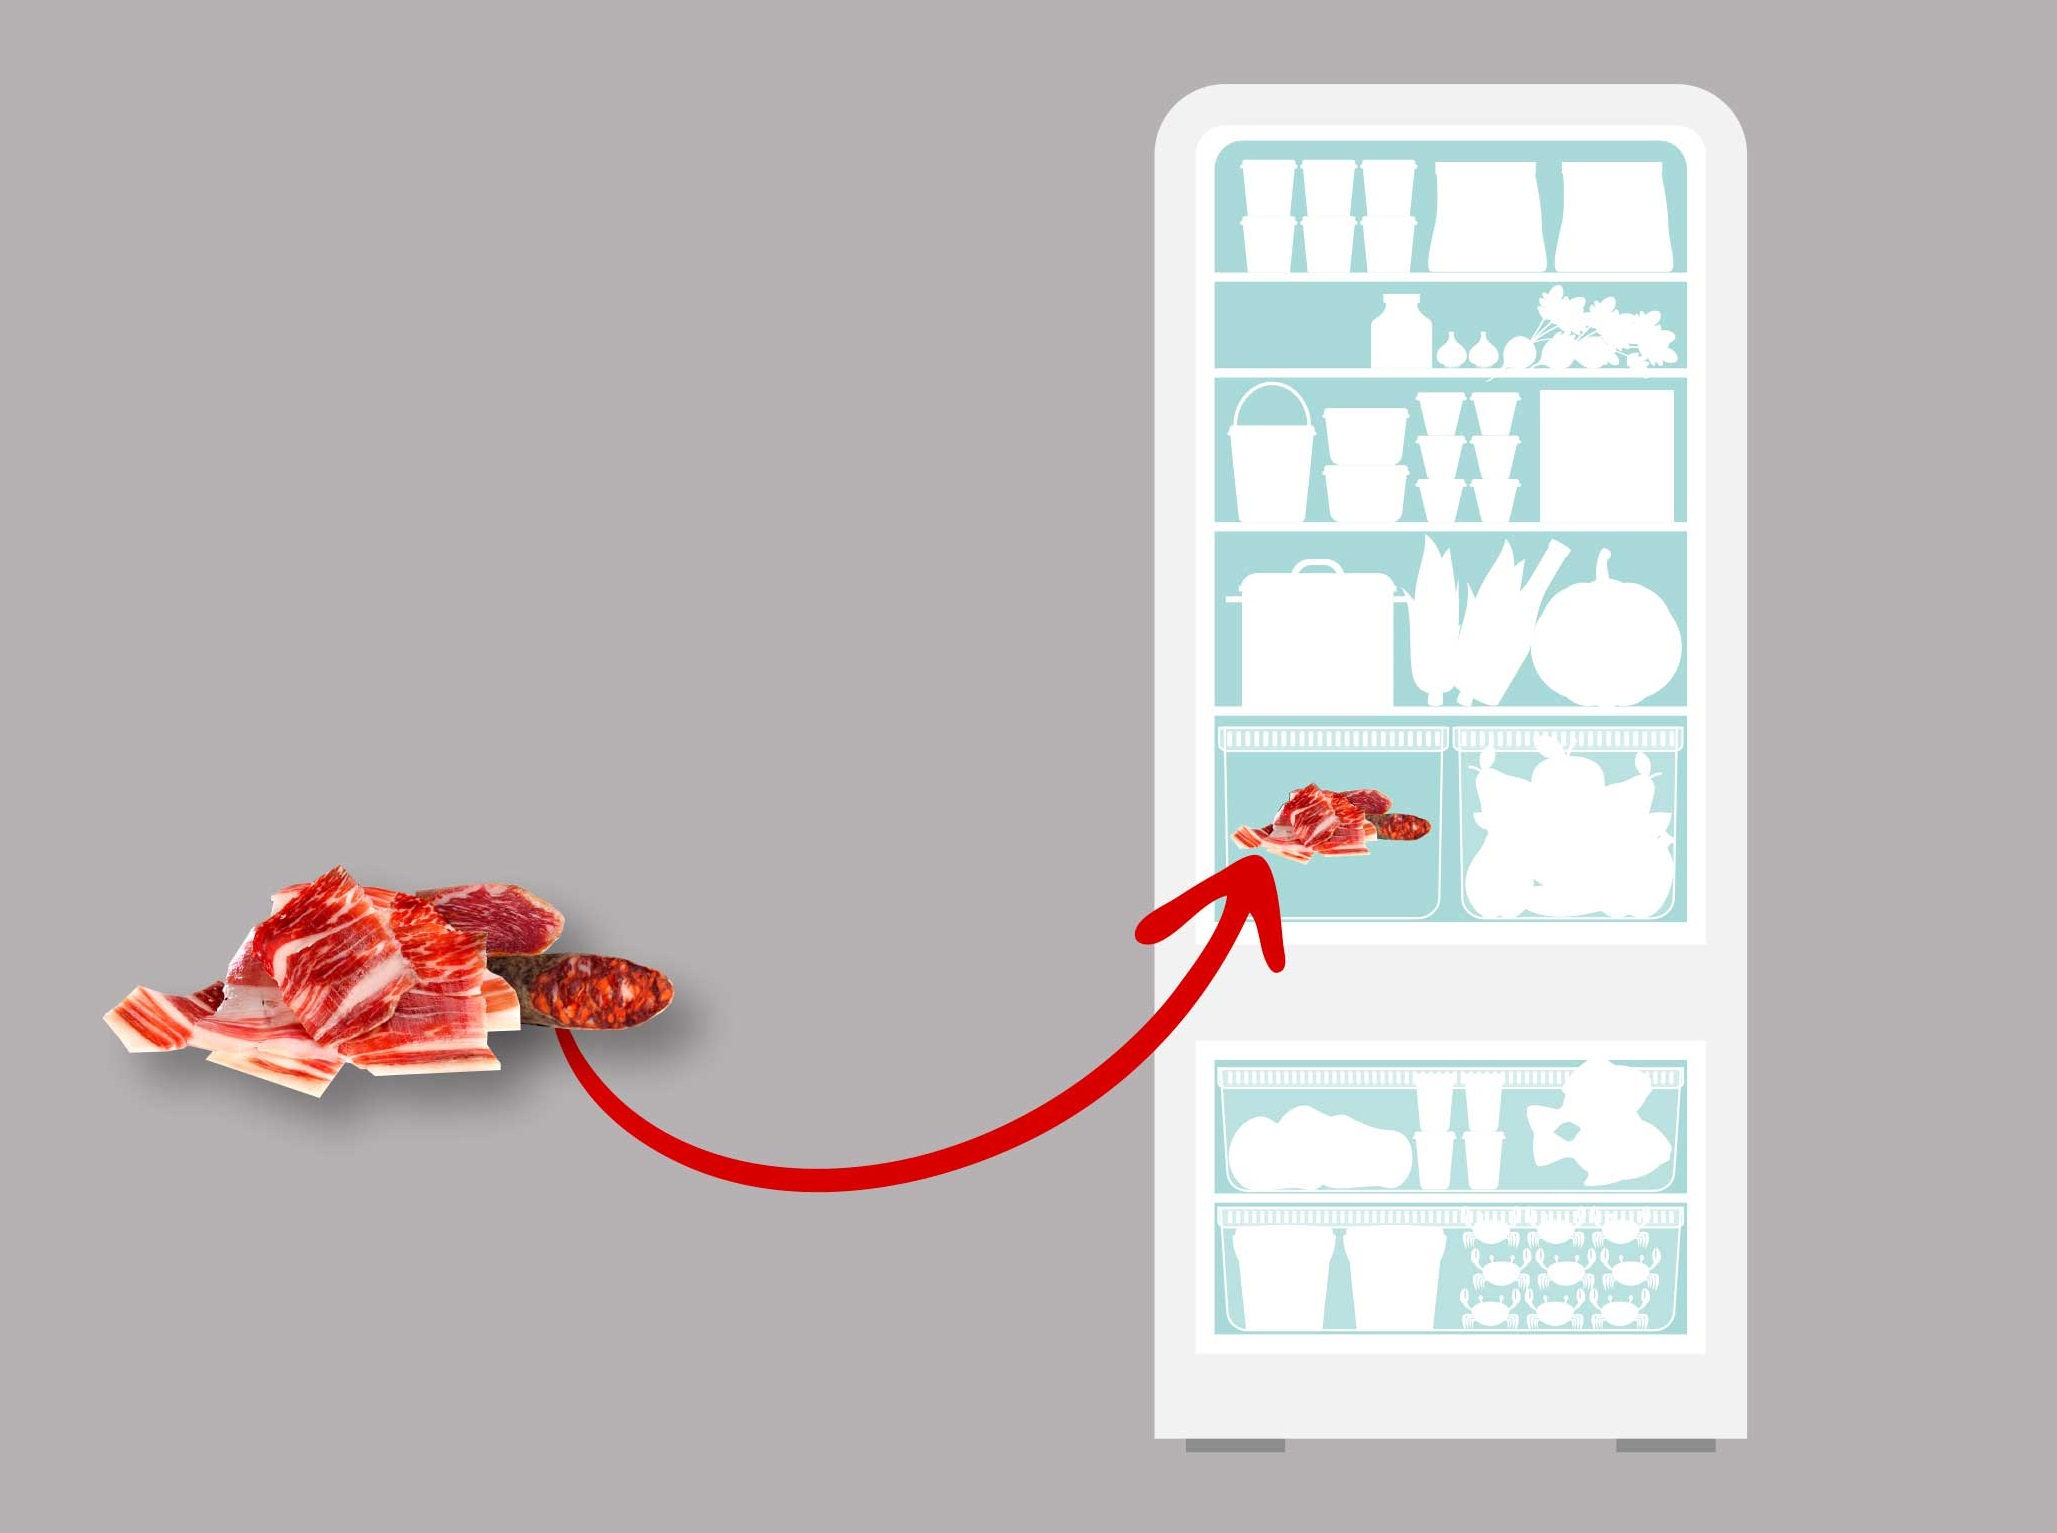 conservación_carne_vueltayvueltacarne.es